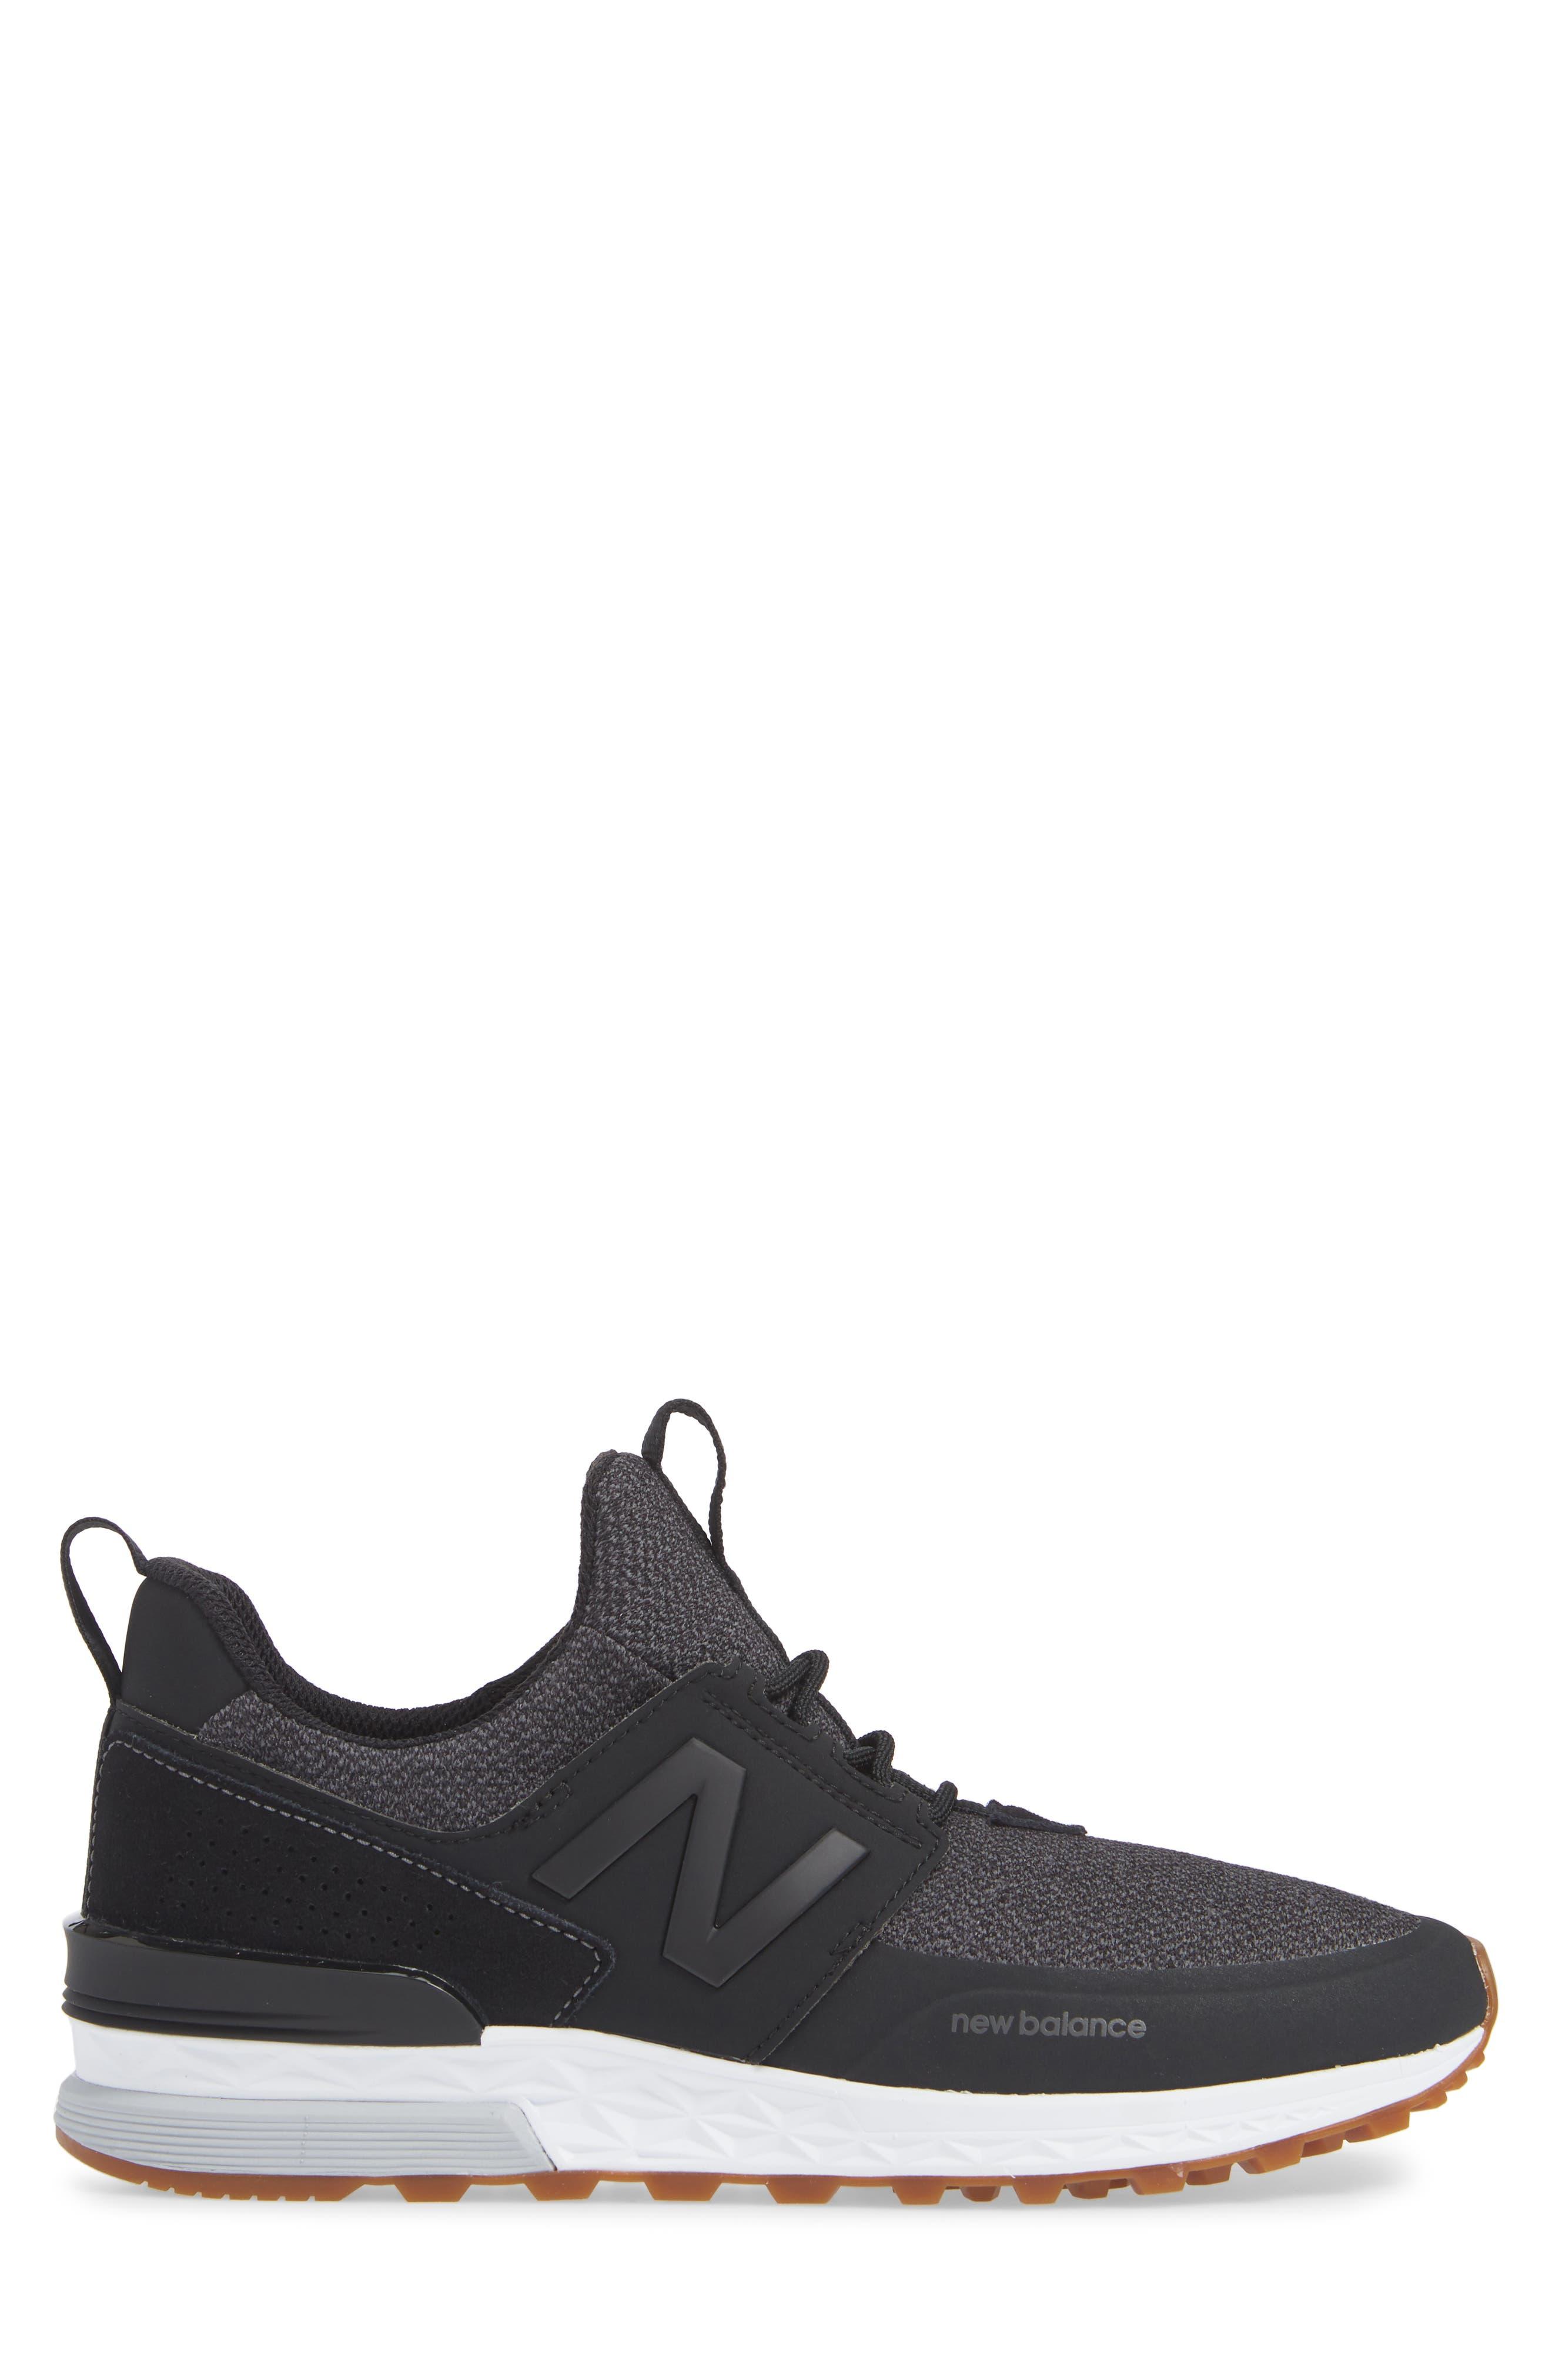 574 Sport Sneaker,                             Alternate thumbnail 3, color,                             BLACK SYNTHETIC/ TEXTILE